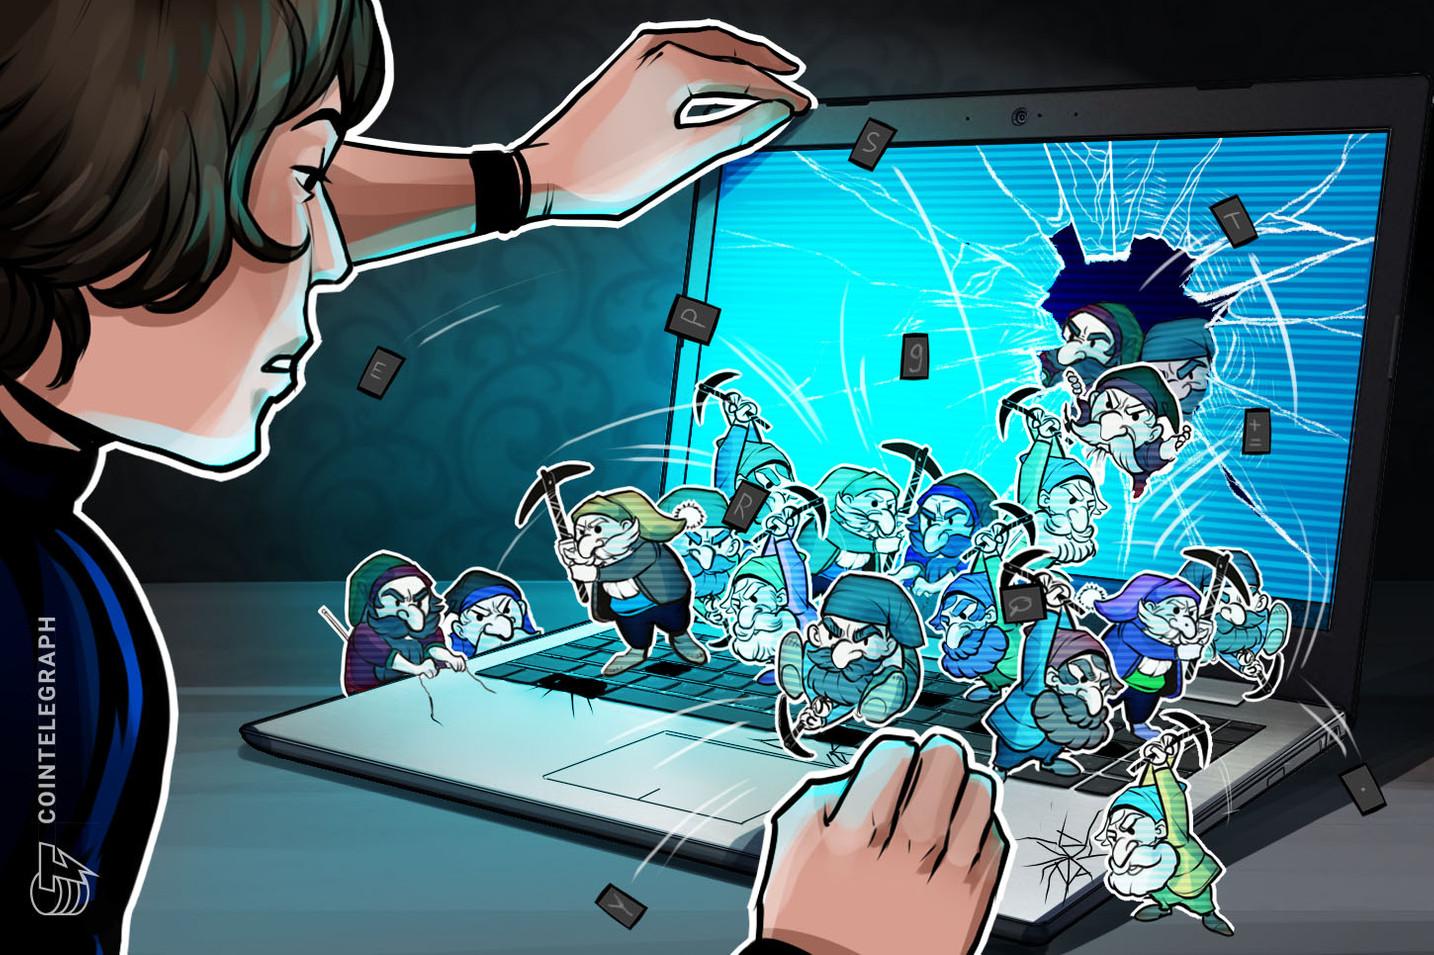 Massive Cyberattack on Australia Uses Cryptojacking Exploits